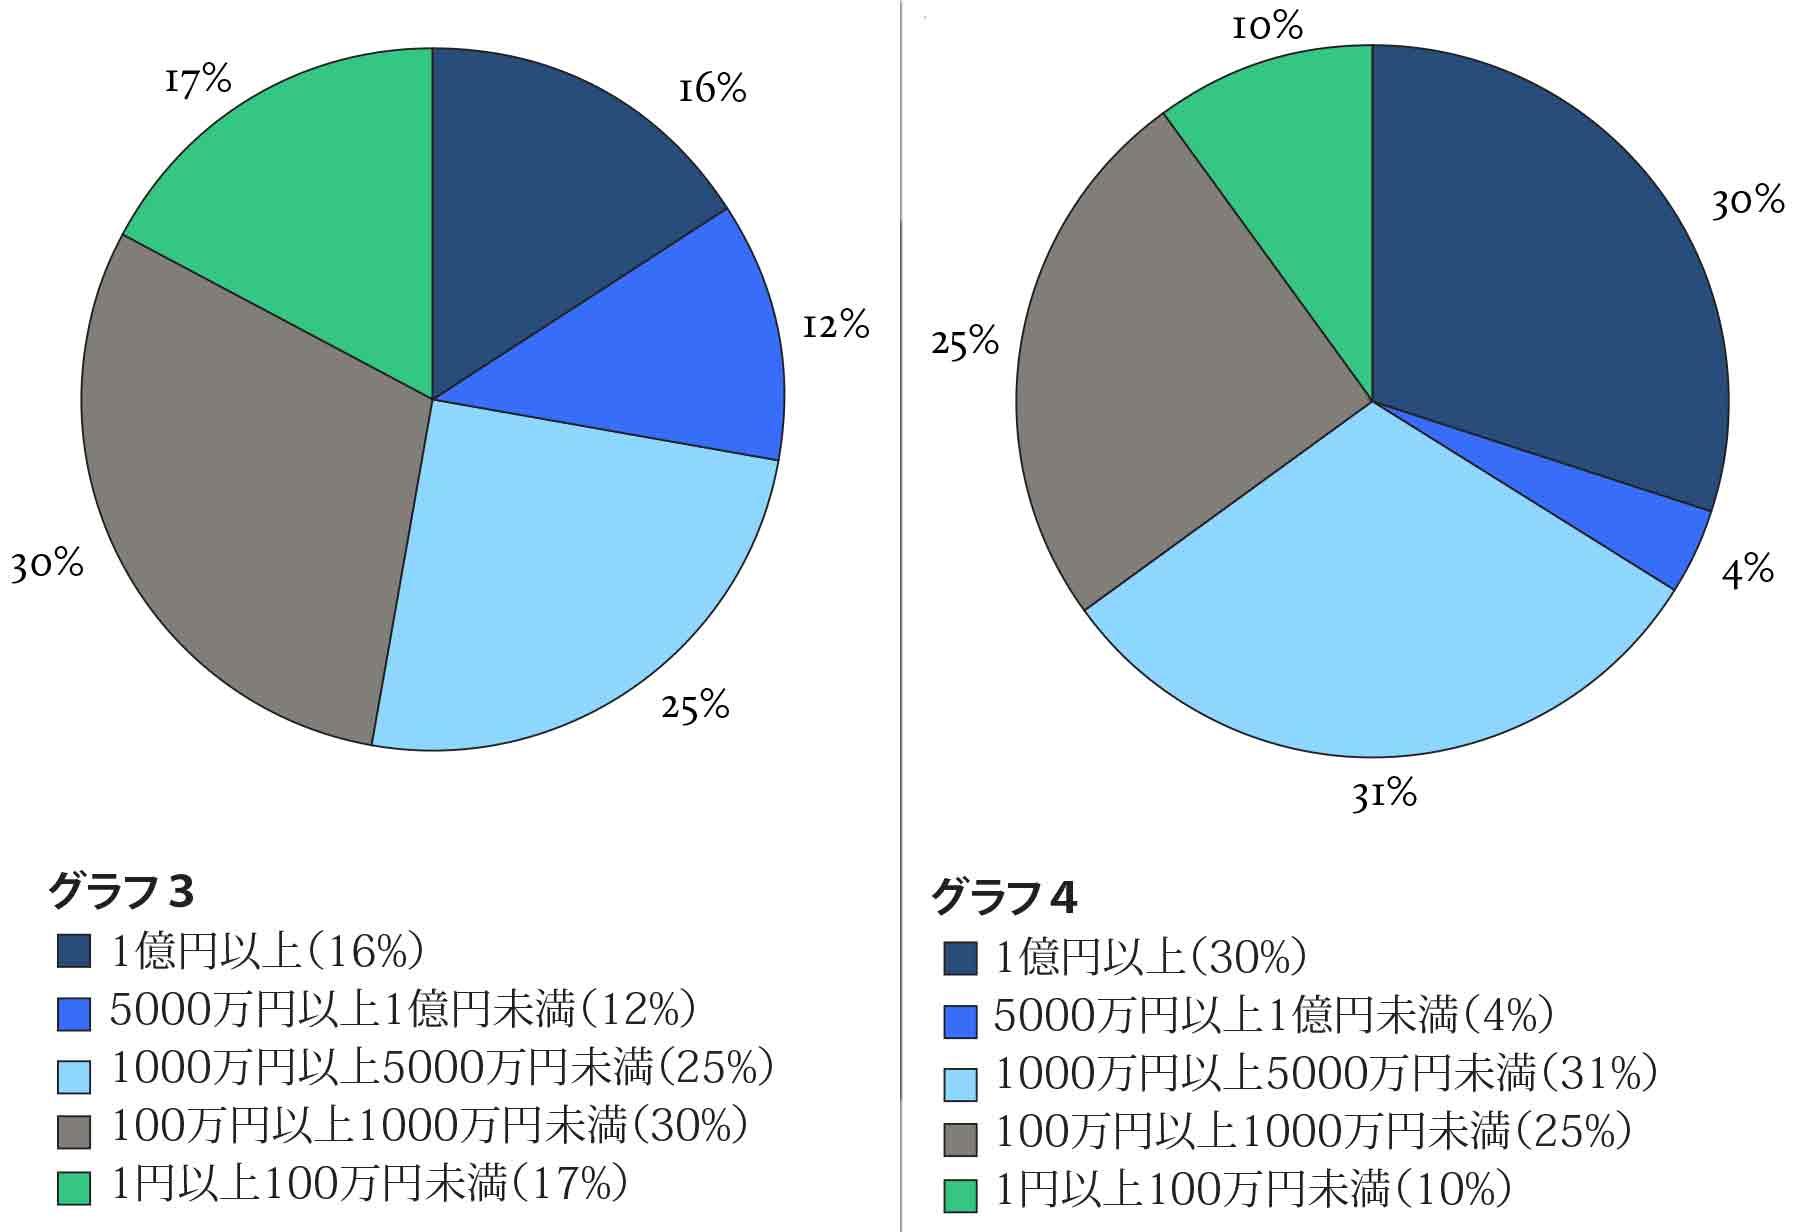 A-COMPARISON-OF-OF-PATENT-LAW-DEVELOPMENT-各国专利法发展对比-Chart-3-4-Japan